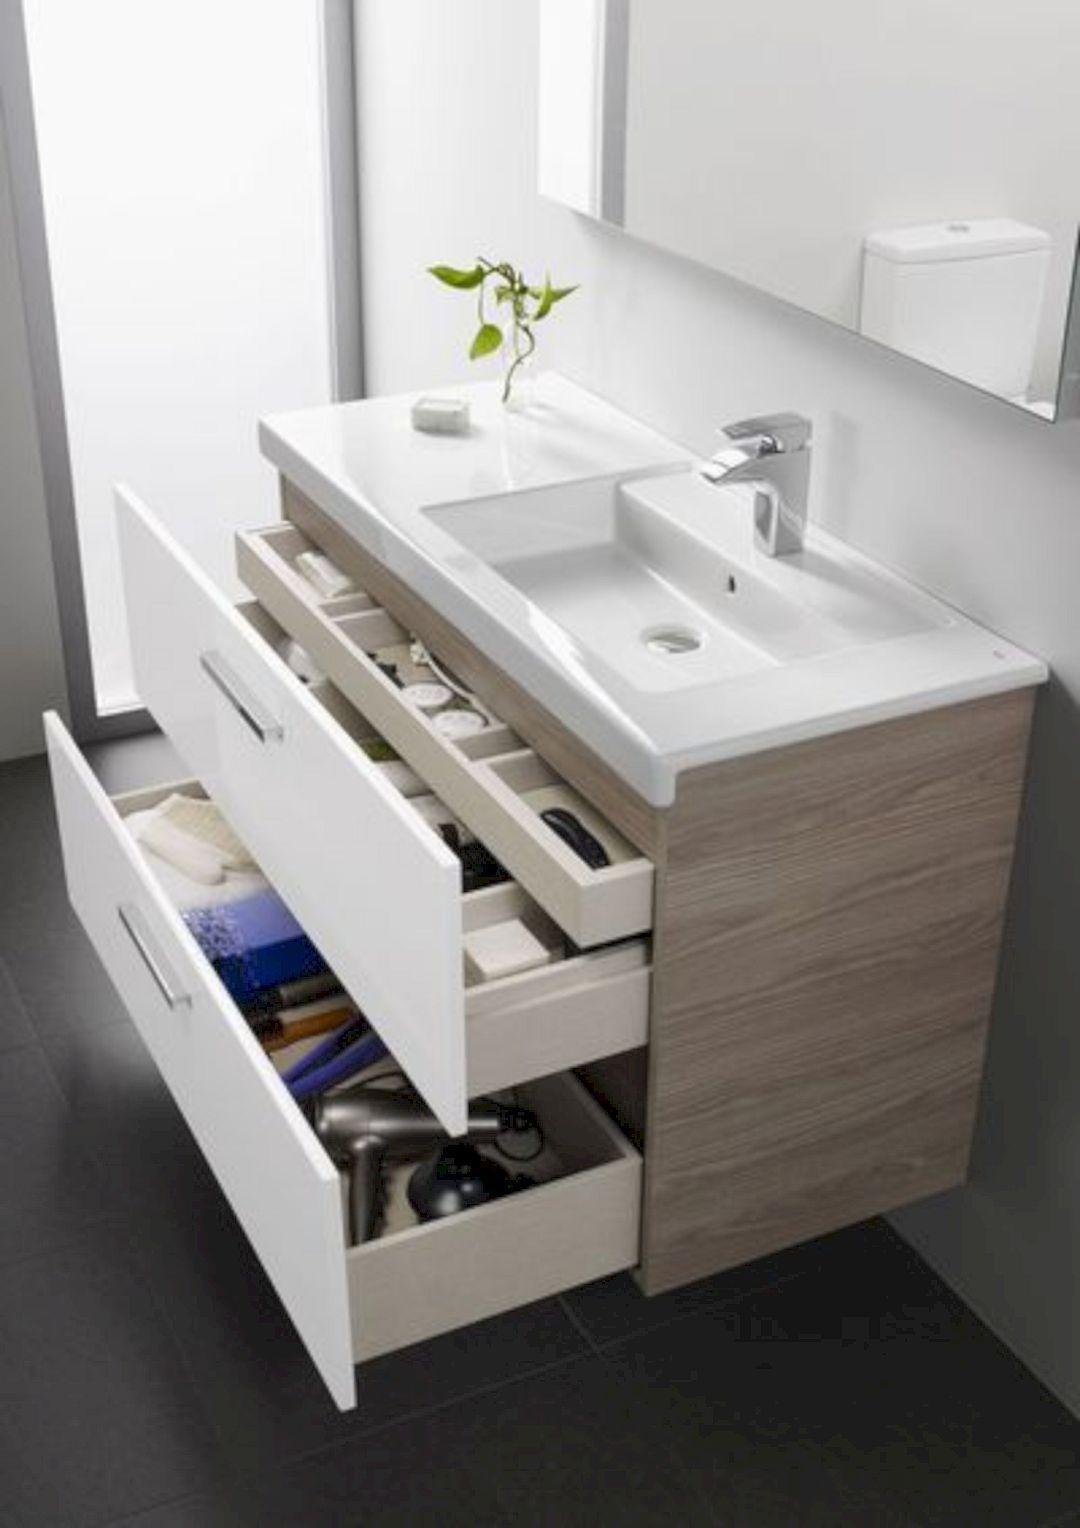 Best 15 Inspiring Bathroom Design Ideas With Ikea Small 400 x 300